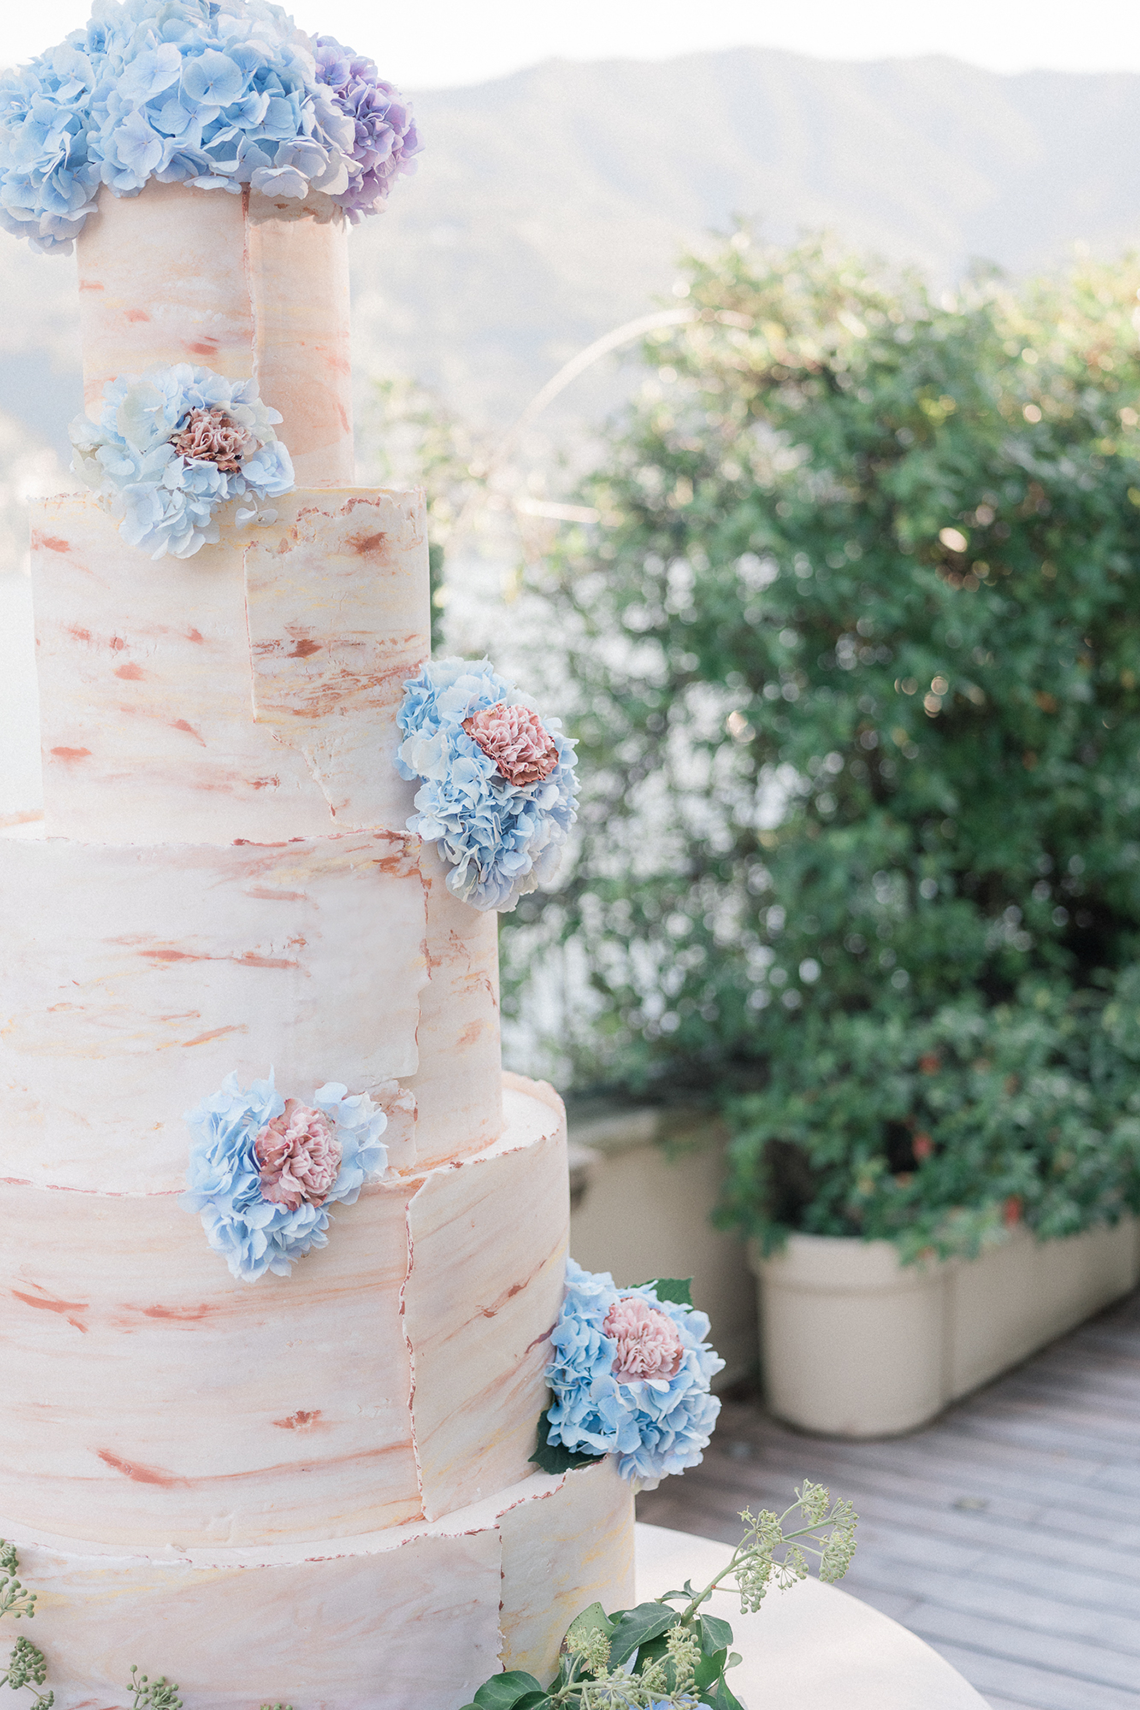 Romantic Something Blue Micro Wedding filled with Hydrangeas at Villa Ortensia in Lake Como – Alessandro Colle e Serena Rossi 60